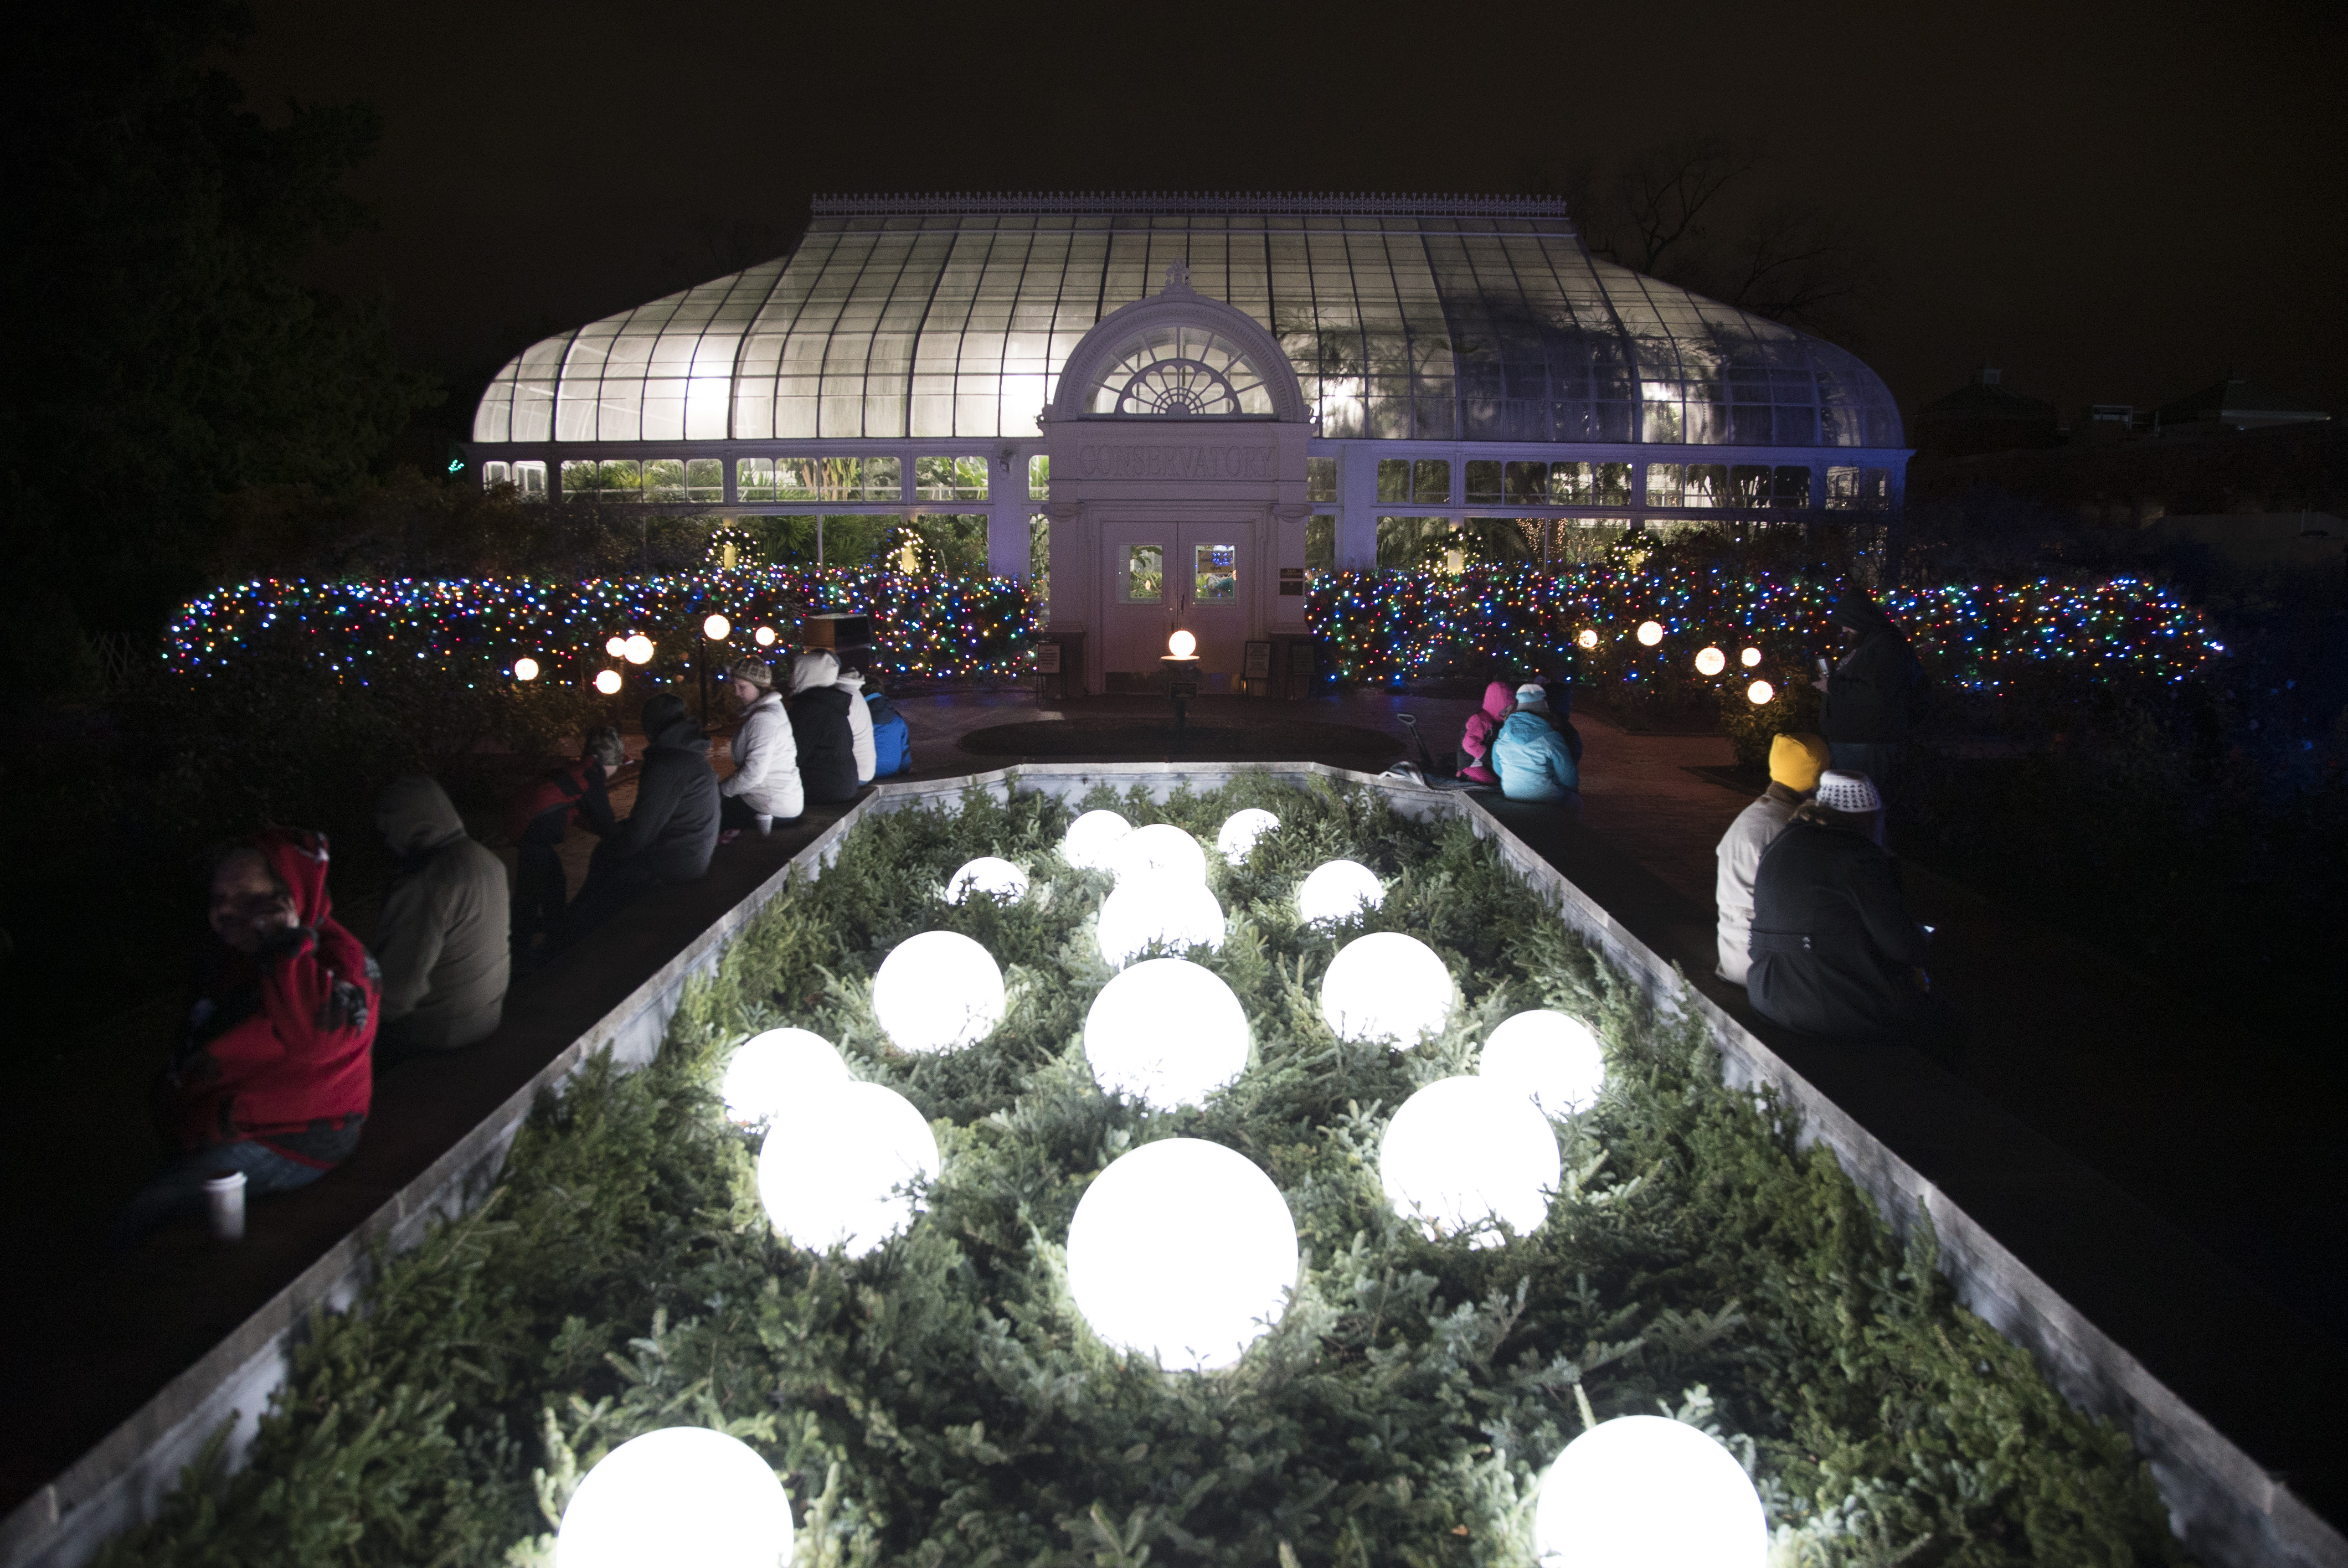 Toledo Zoo Lights Before Christmas | Toledo Region